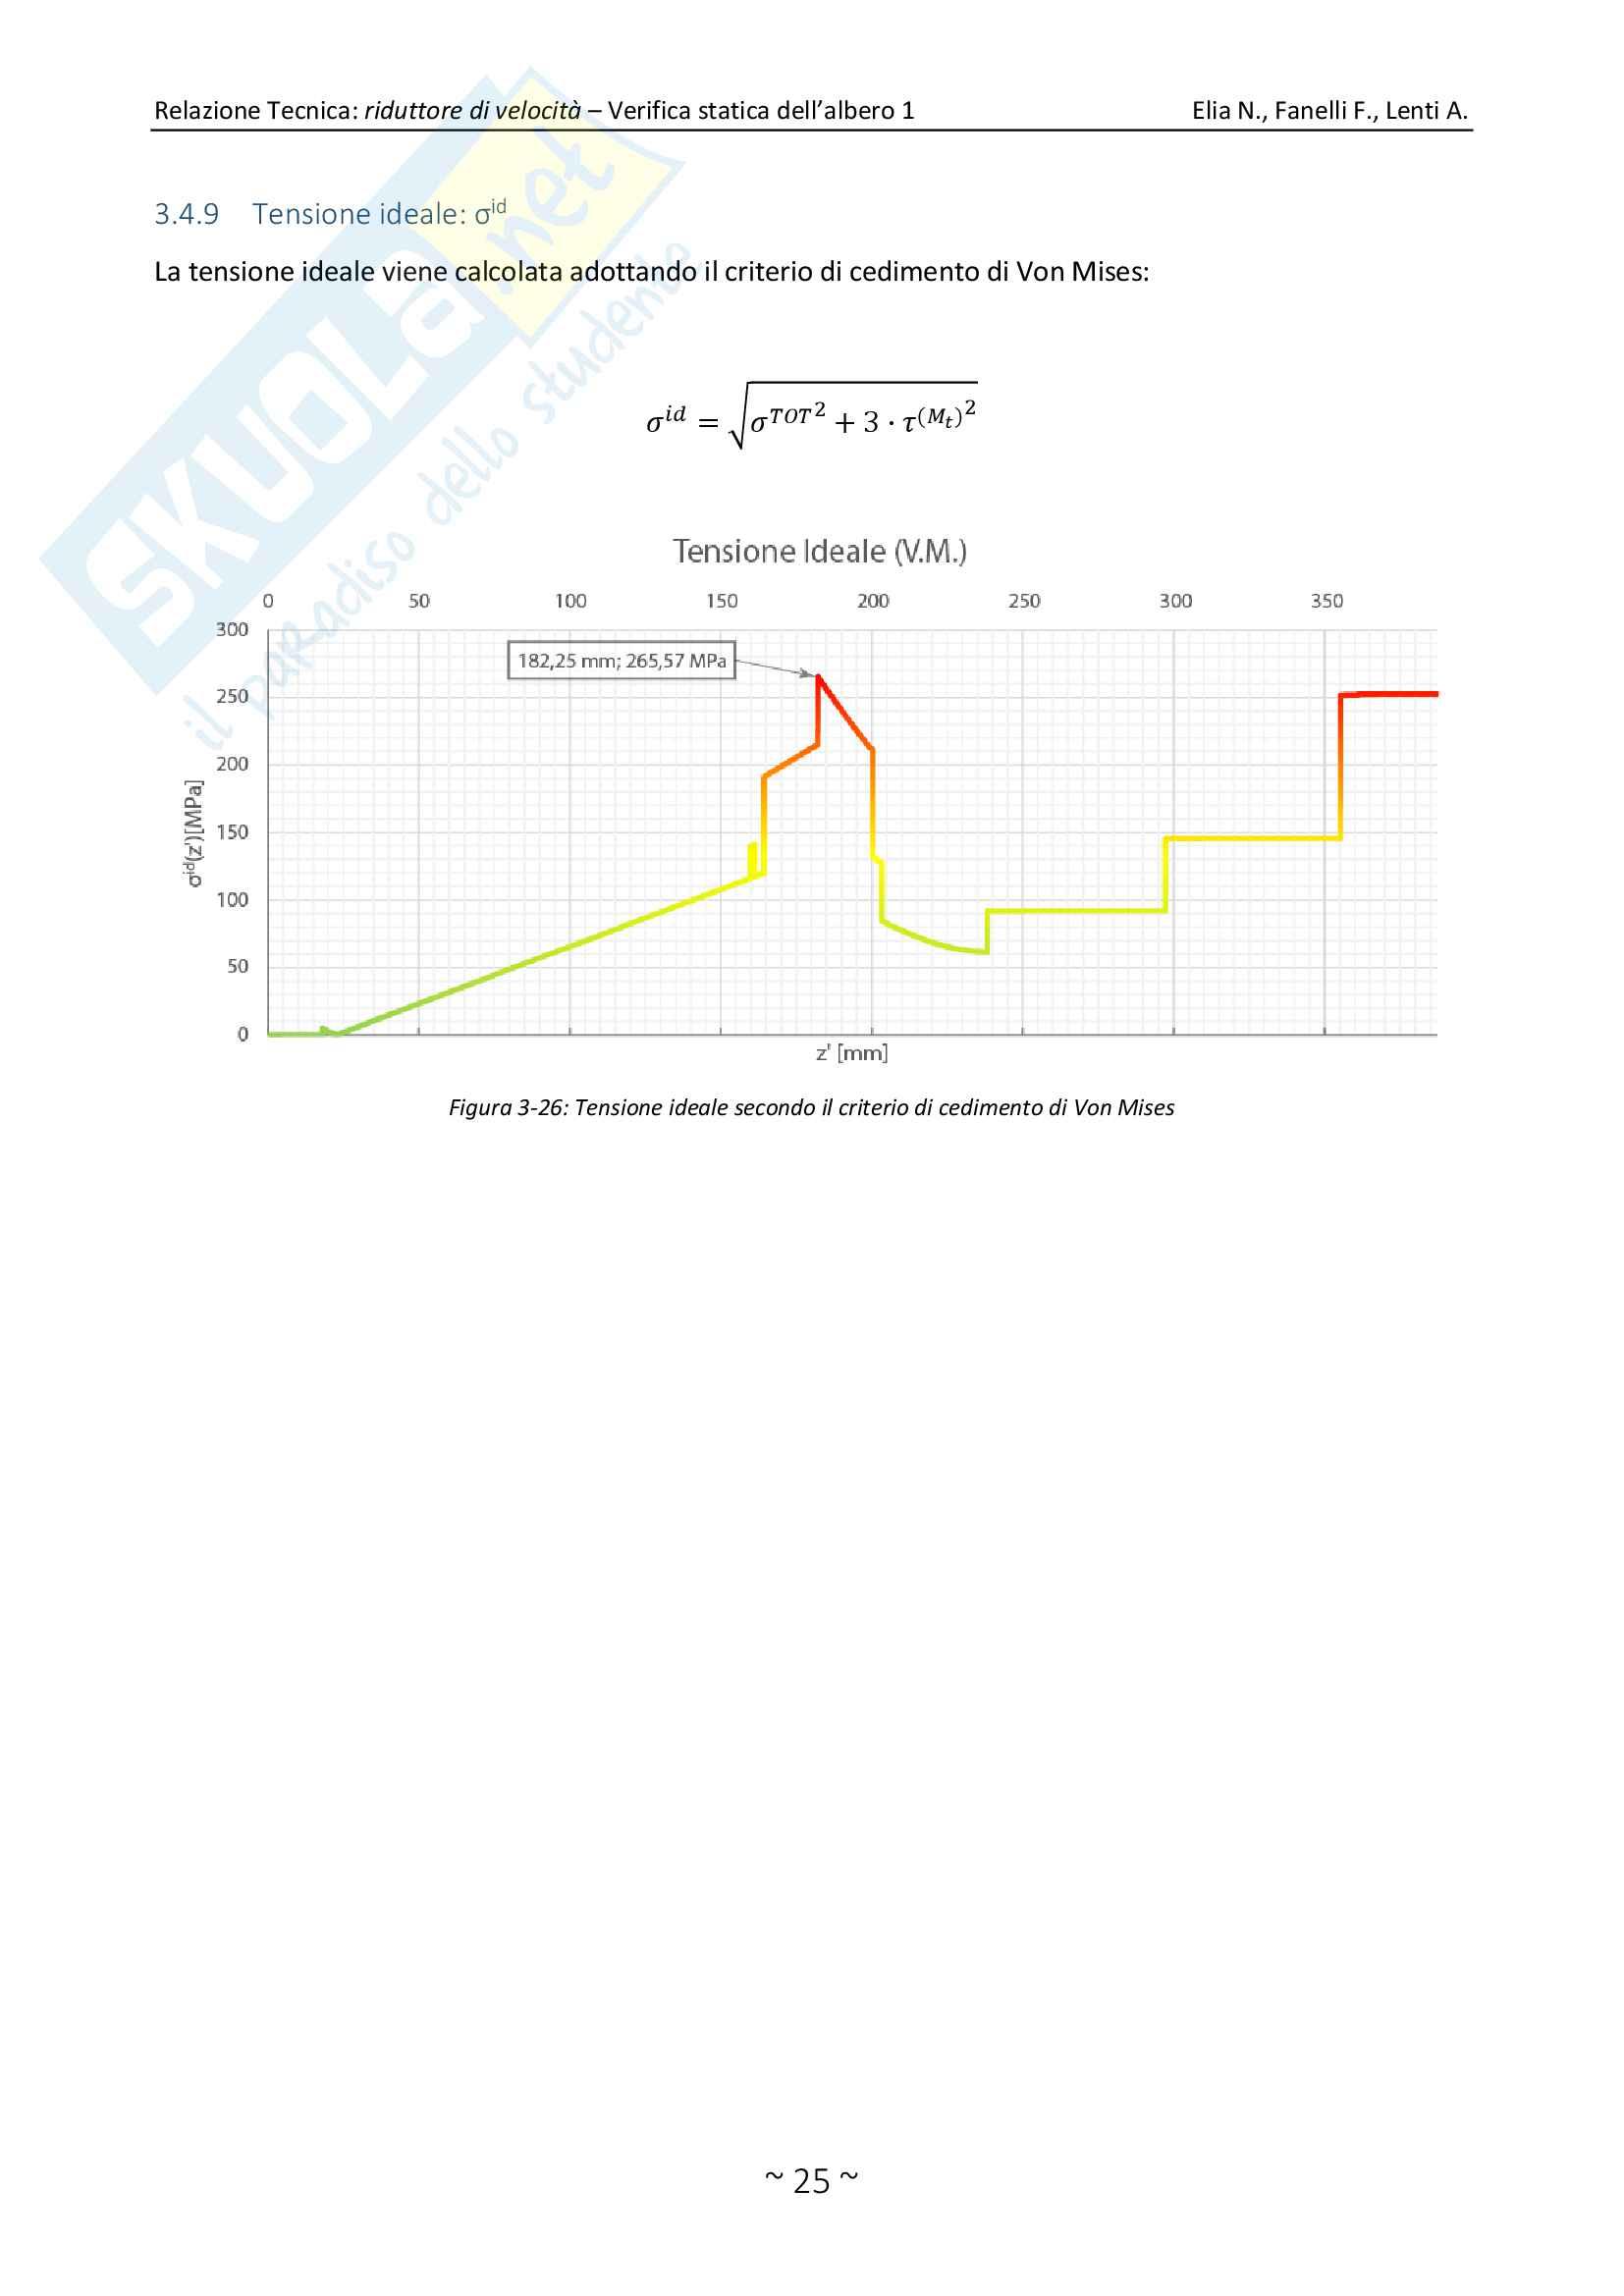 Relazione Tecnica Perfetta, Costruzione di Macchine, Berruti, Brusa Pag. 26